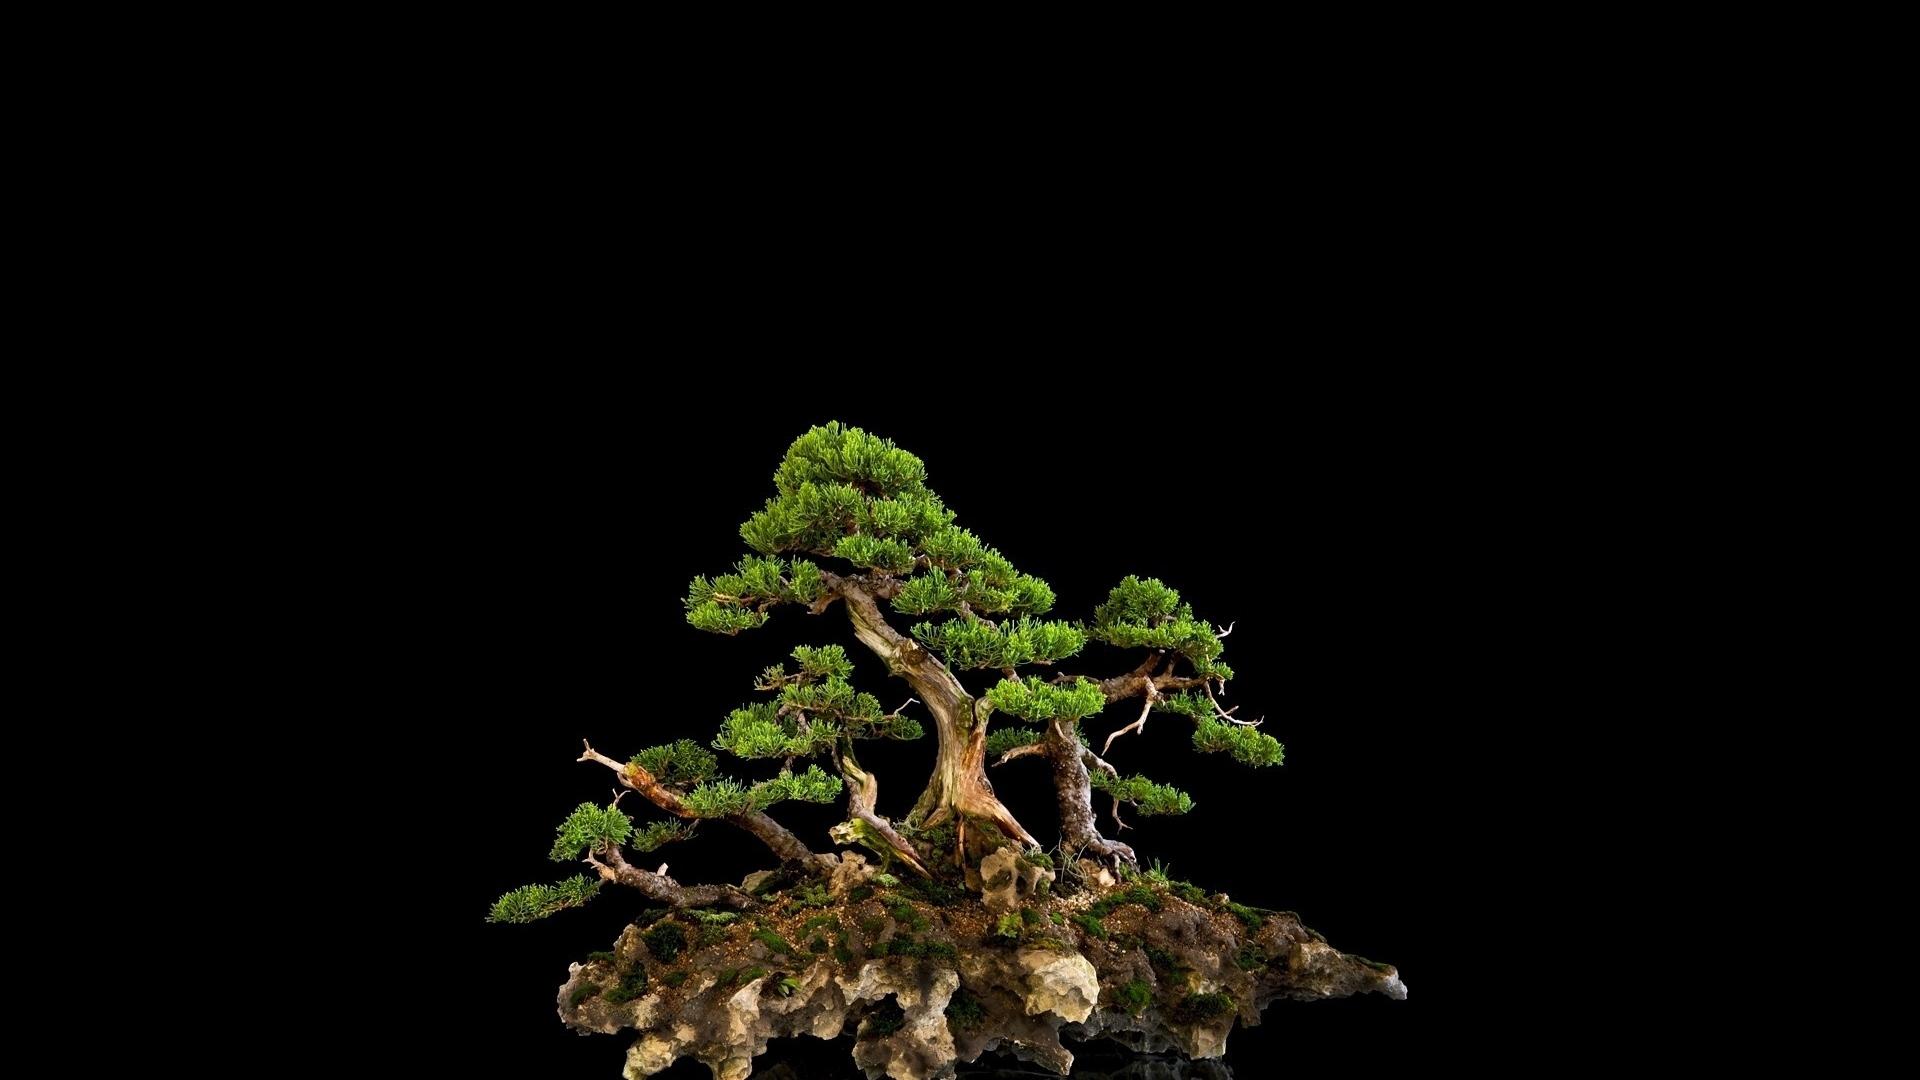 Earnings Disclaimer >> Download Wallpaper 1920x1080 tree, bonsai, black ...